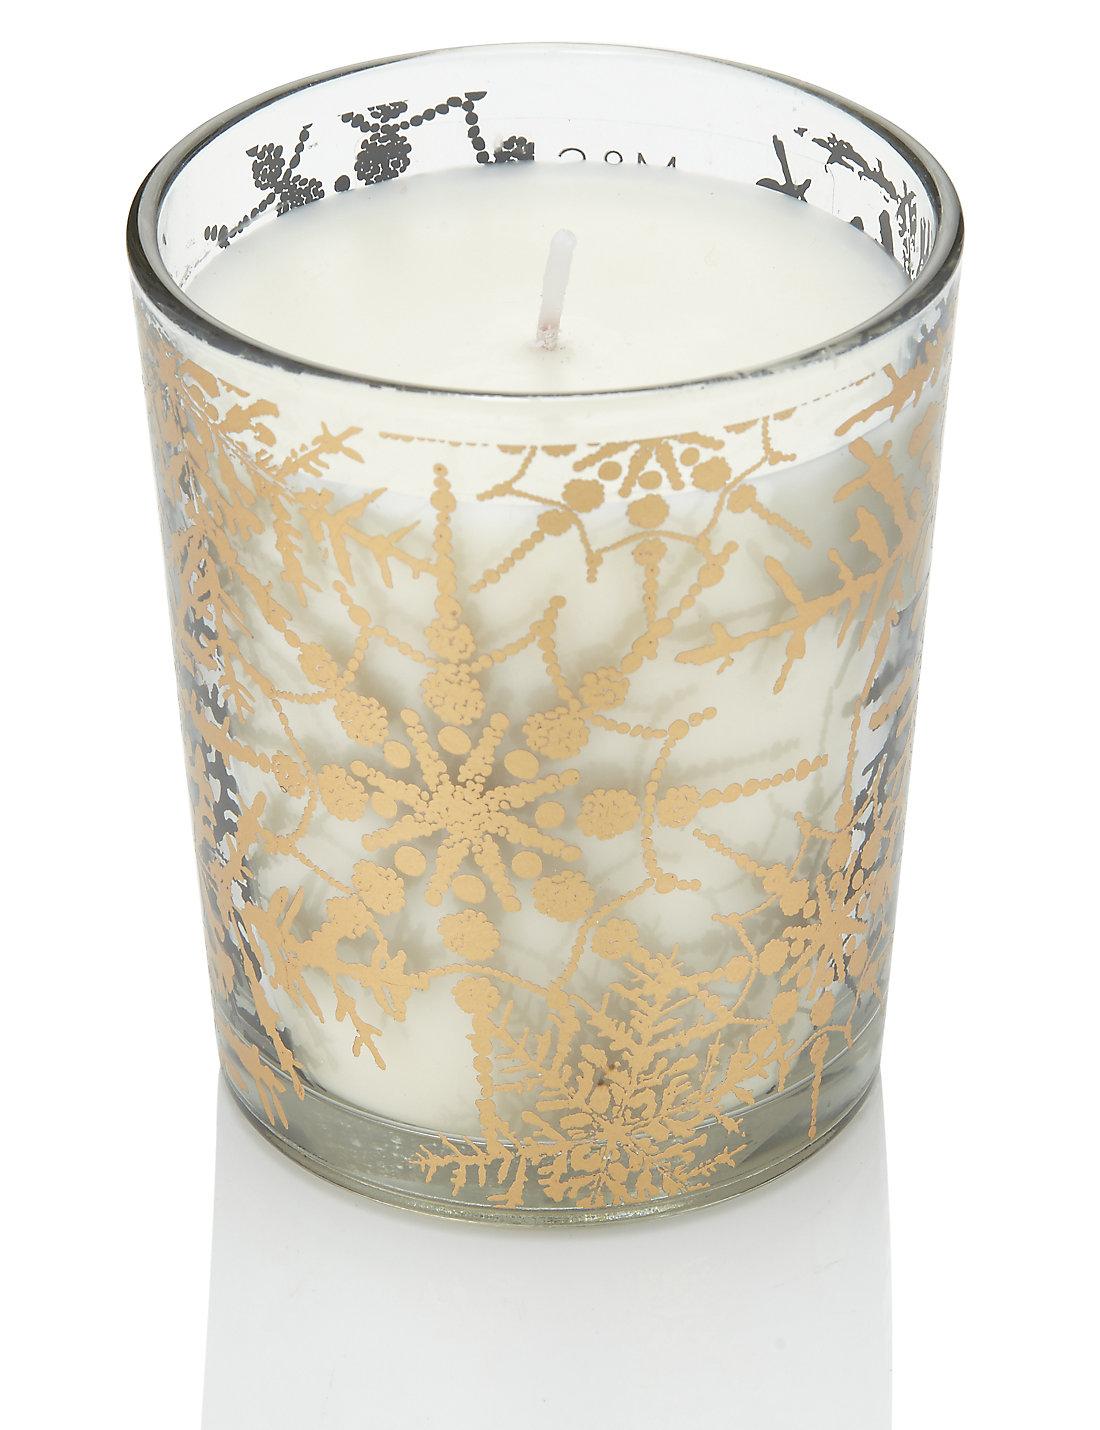 Frankincense & Myrrh Scented Mercury Filled Candle   M&S